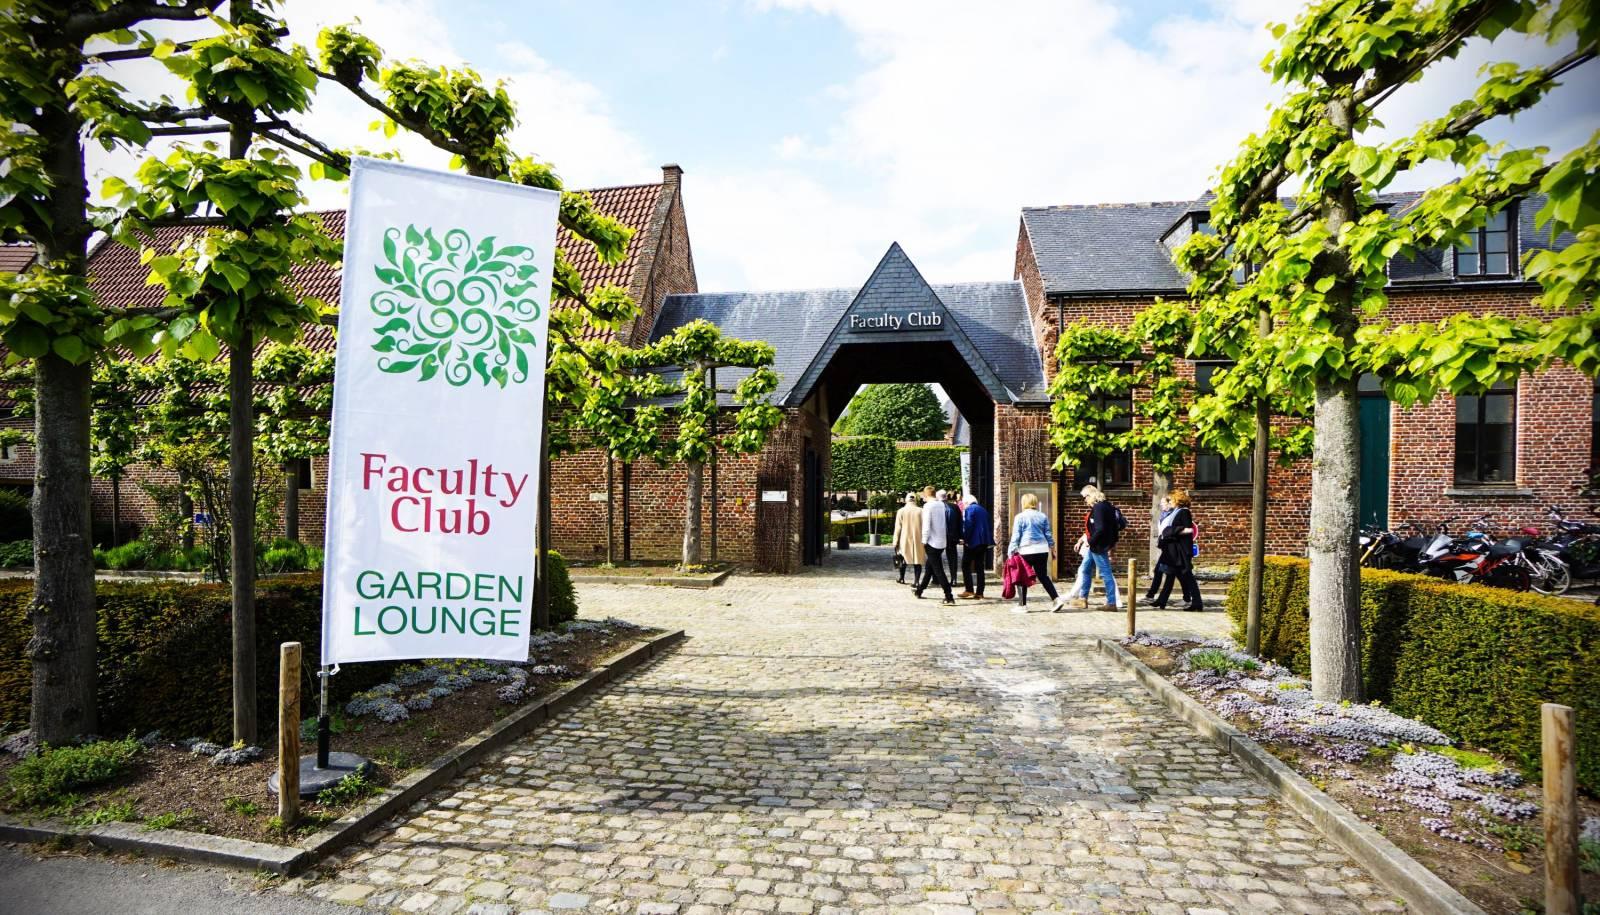 Faculty Club - Feestzaal te Leuven - Eventlocatie - GARDEN LOUNGE MEI 2019 - House of Events - 5